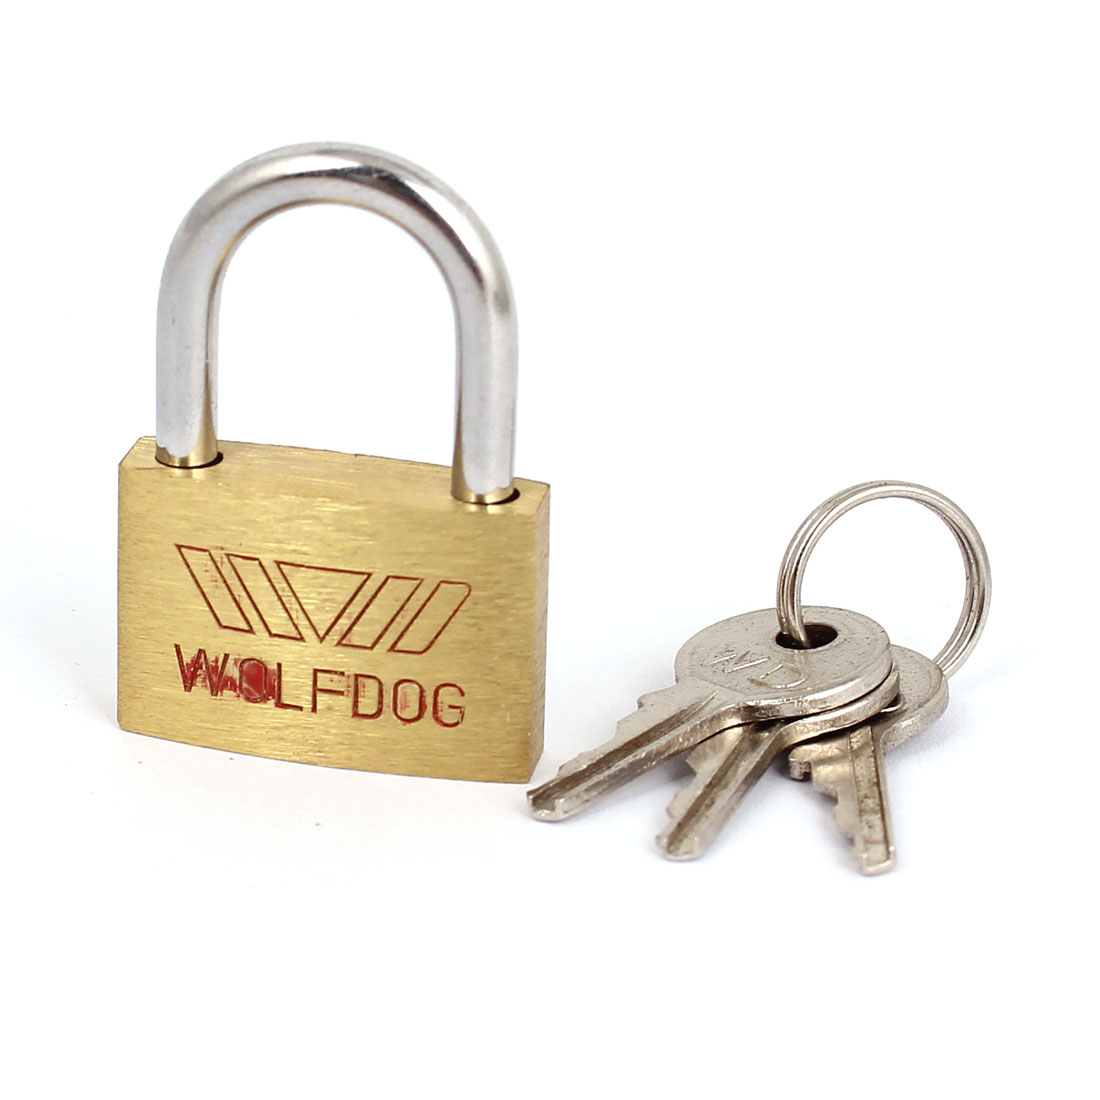 Brass Tone Metal Tiny Box Cabinet Showcase Safety Padlock Locks w keys